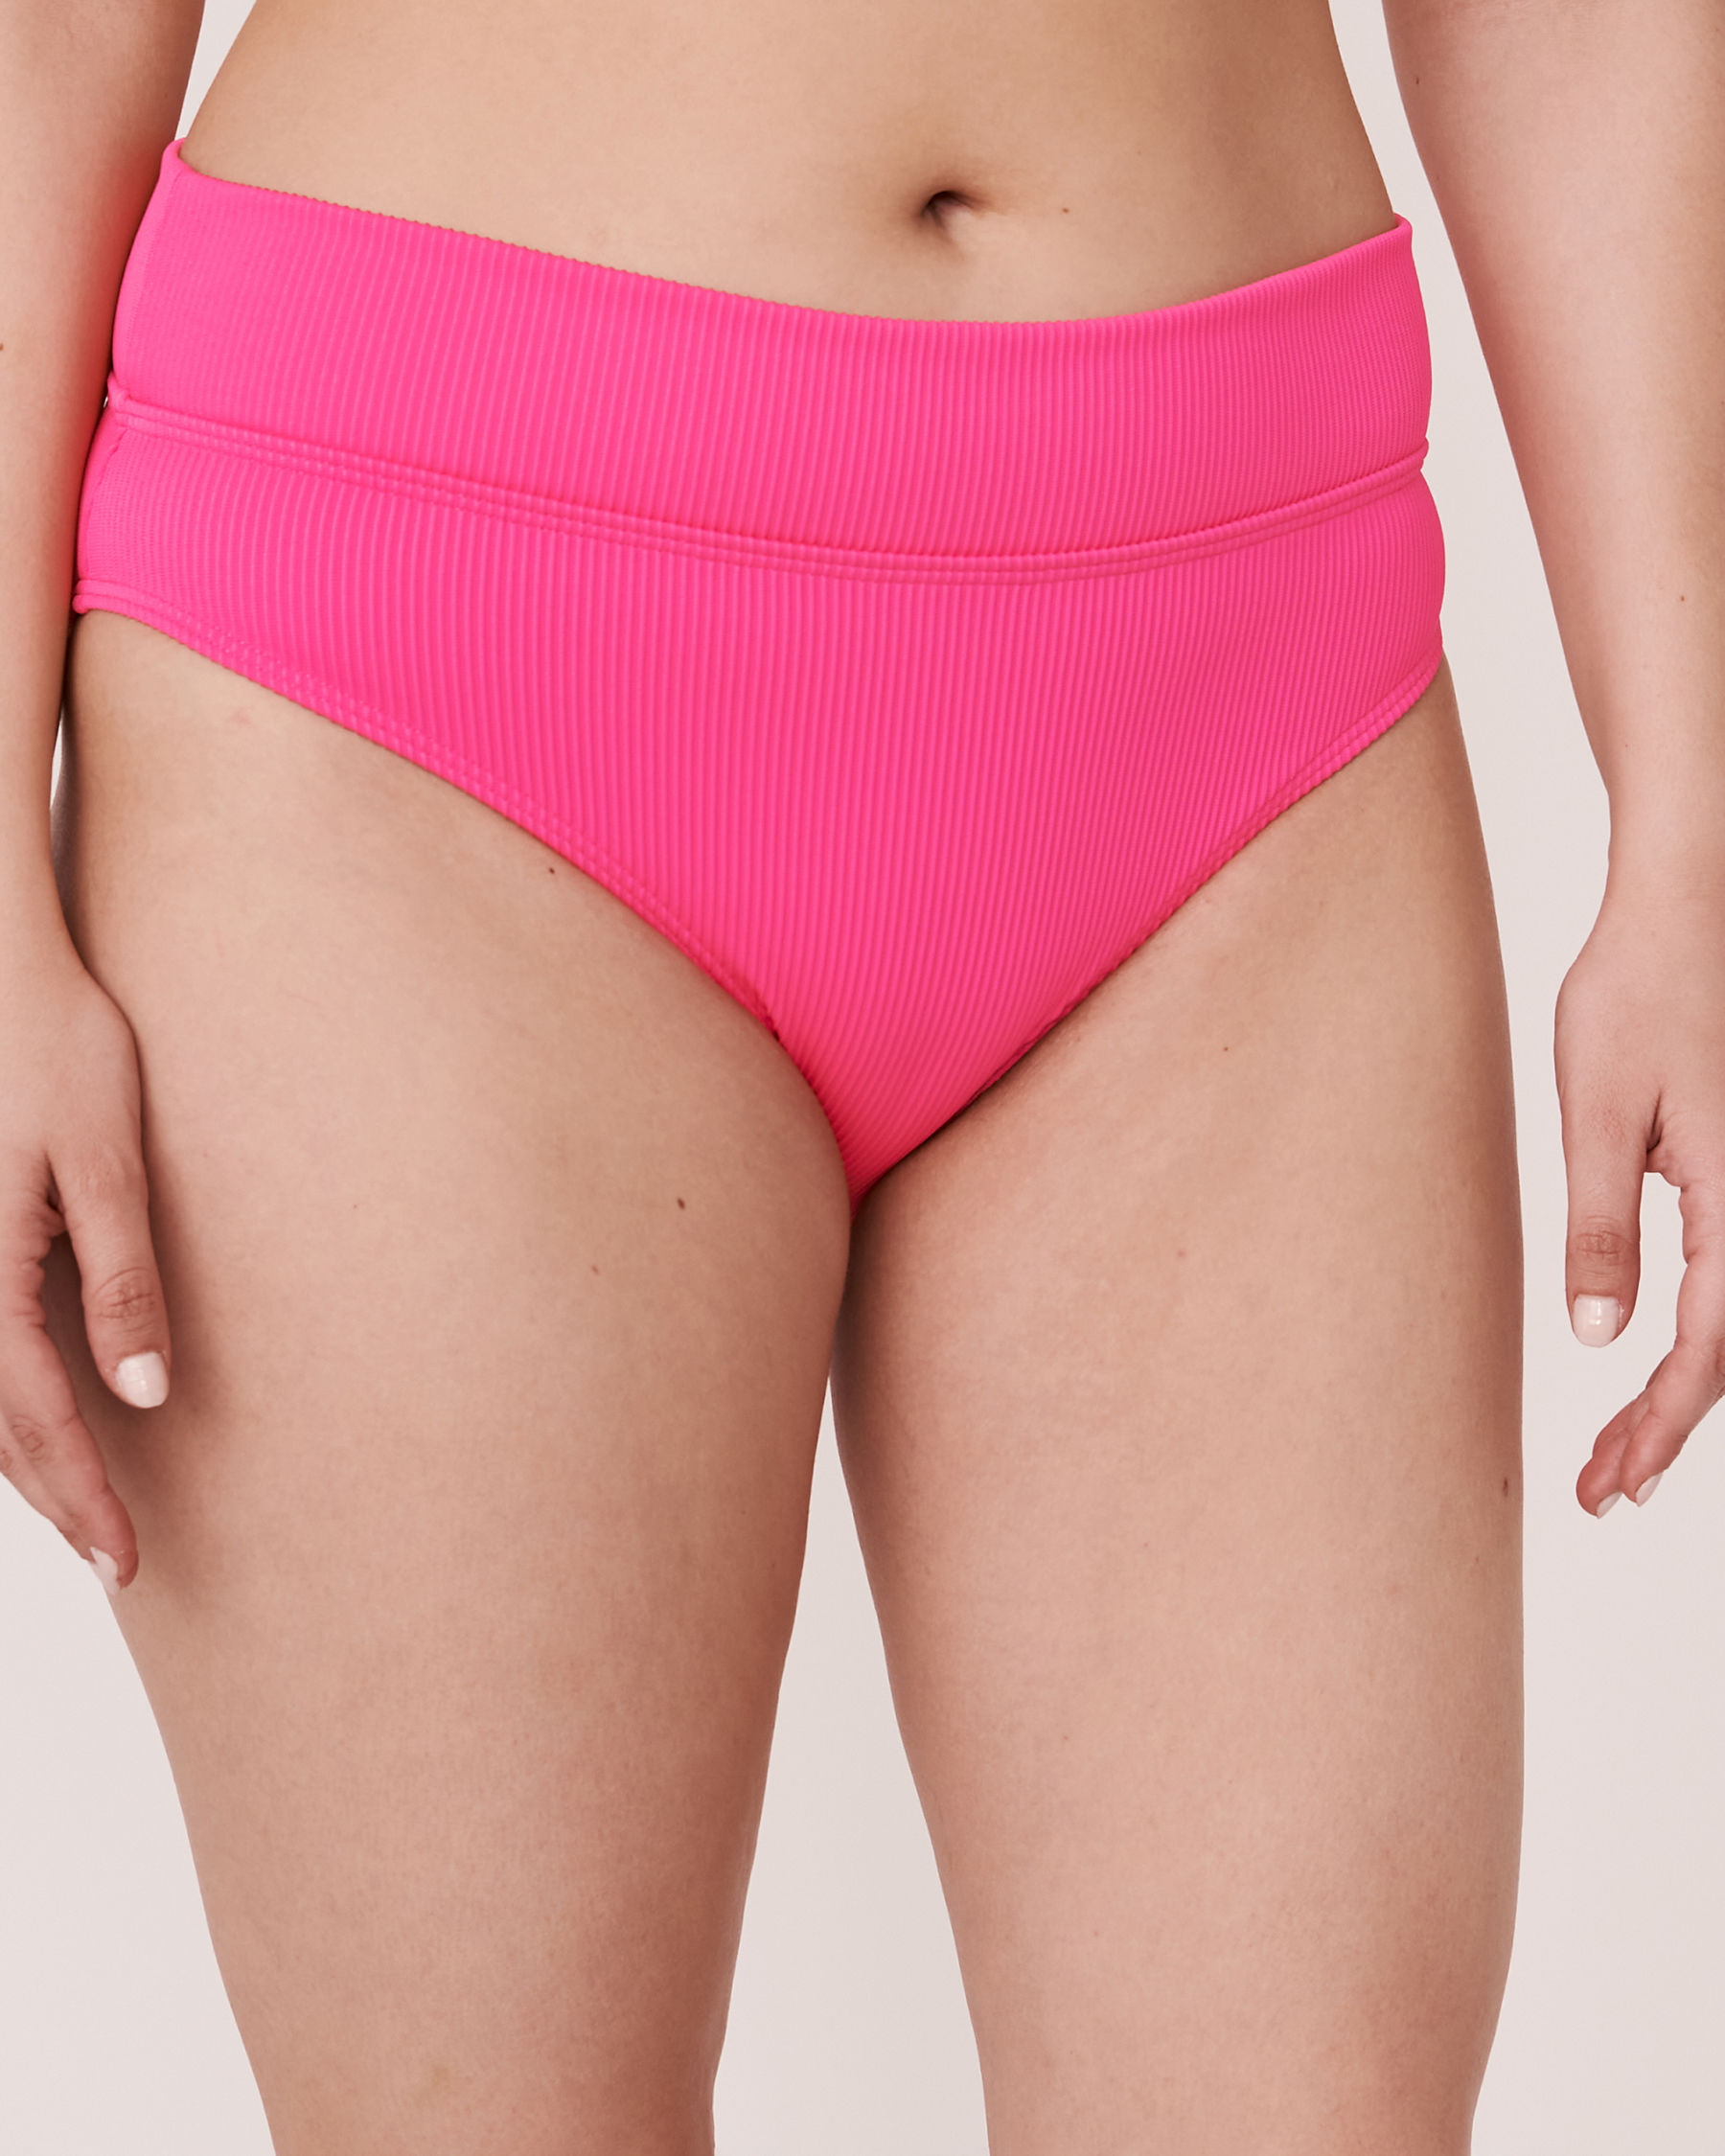 LA VIE EN ROSE AQUA Bas de bikini bande de taille pliable en fibres recyclées TOOTSIE RIB Rose néon 70300063 - Voir3